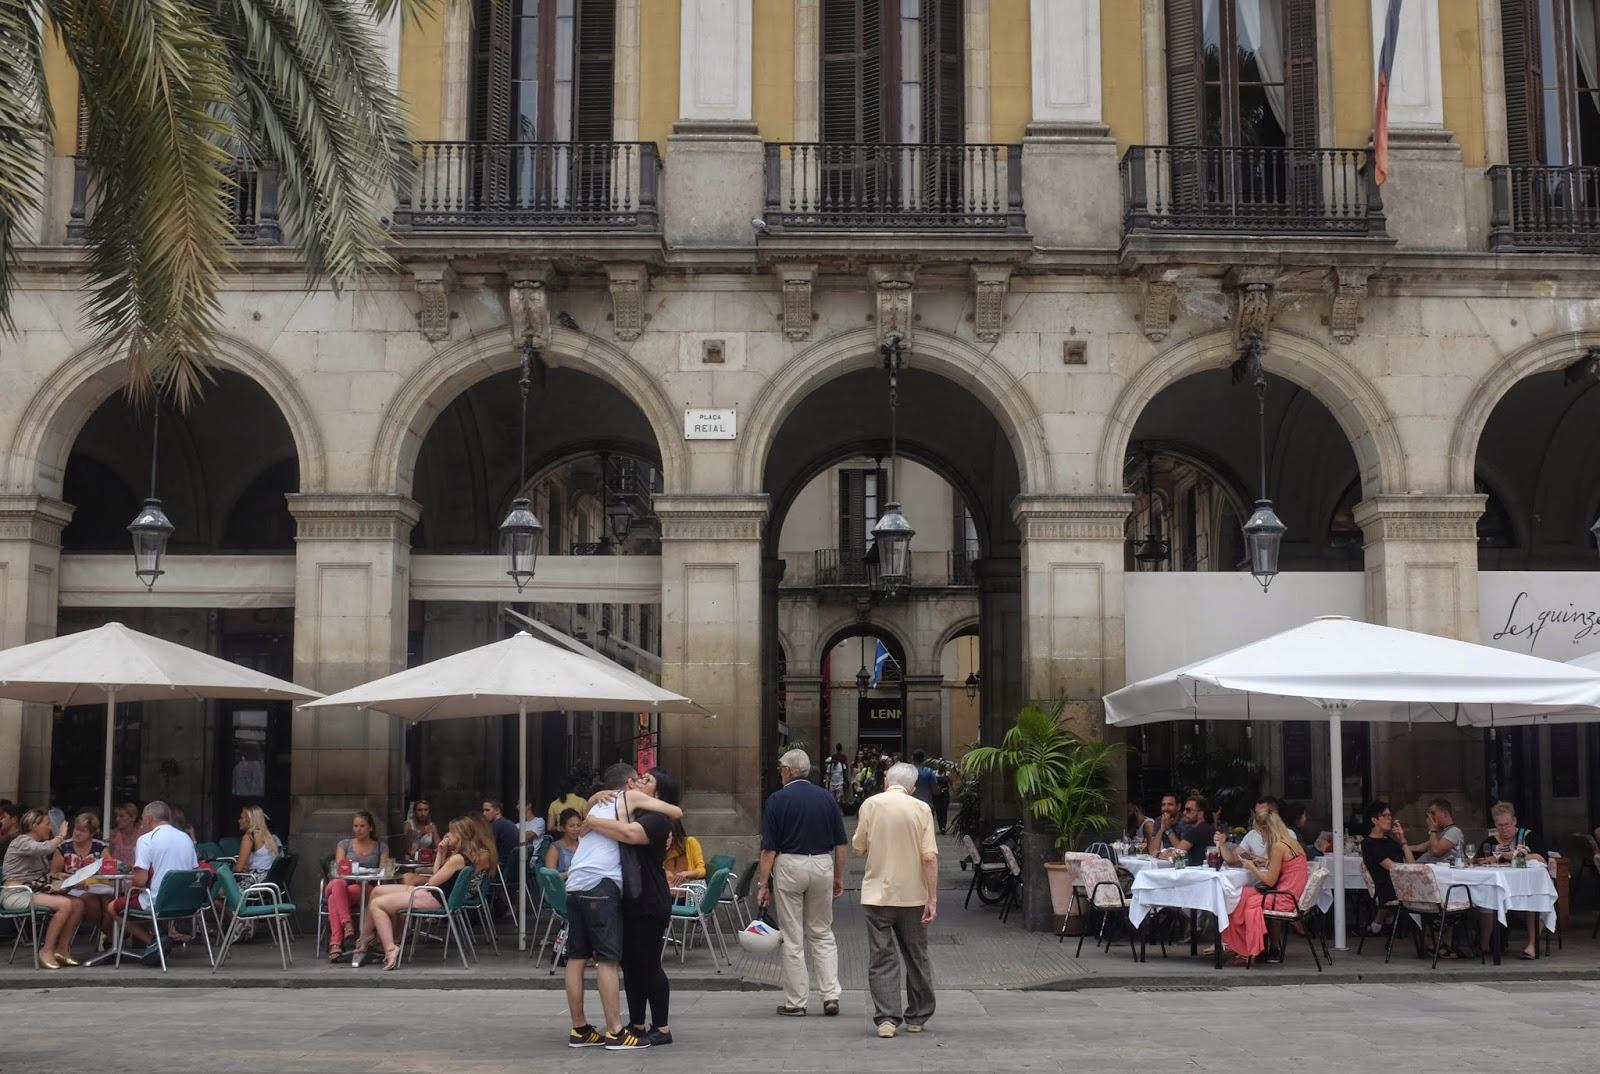 Plaça Reial (Royal Plaza) Barcelona